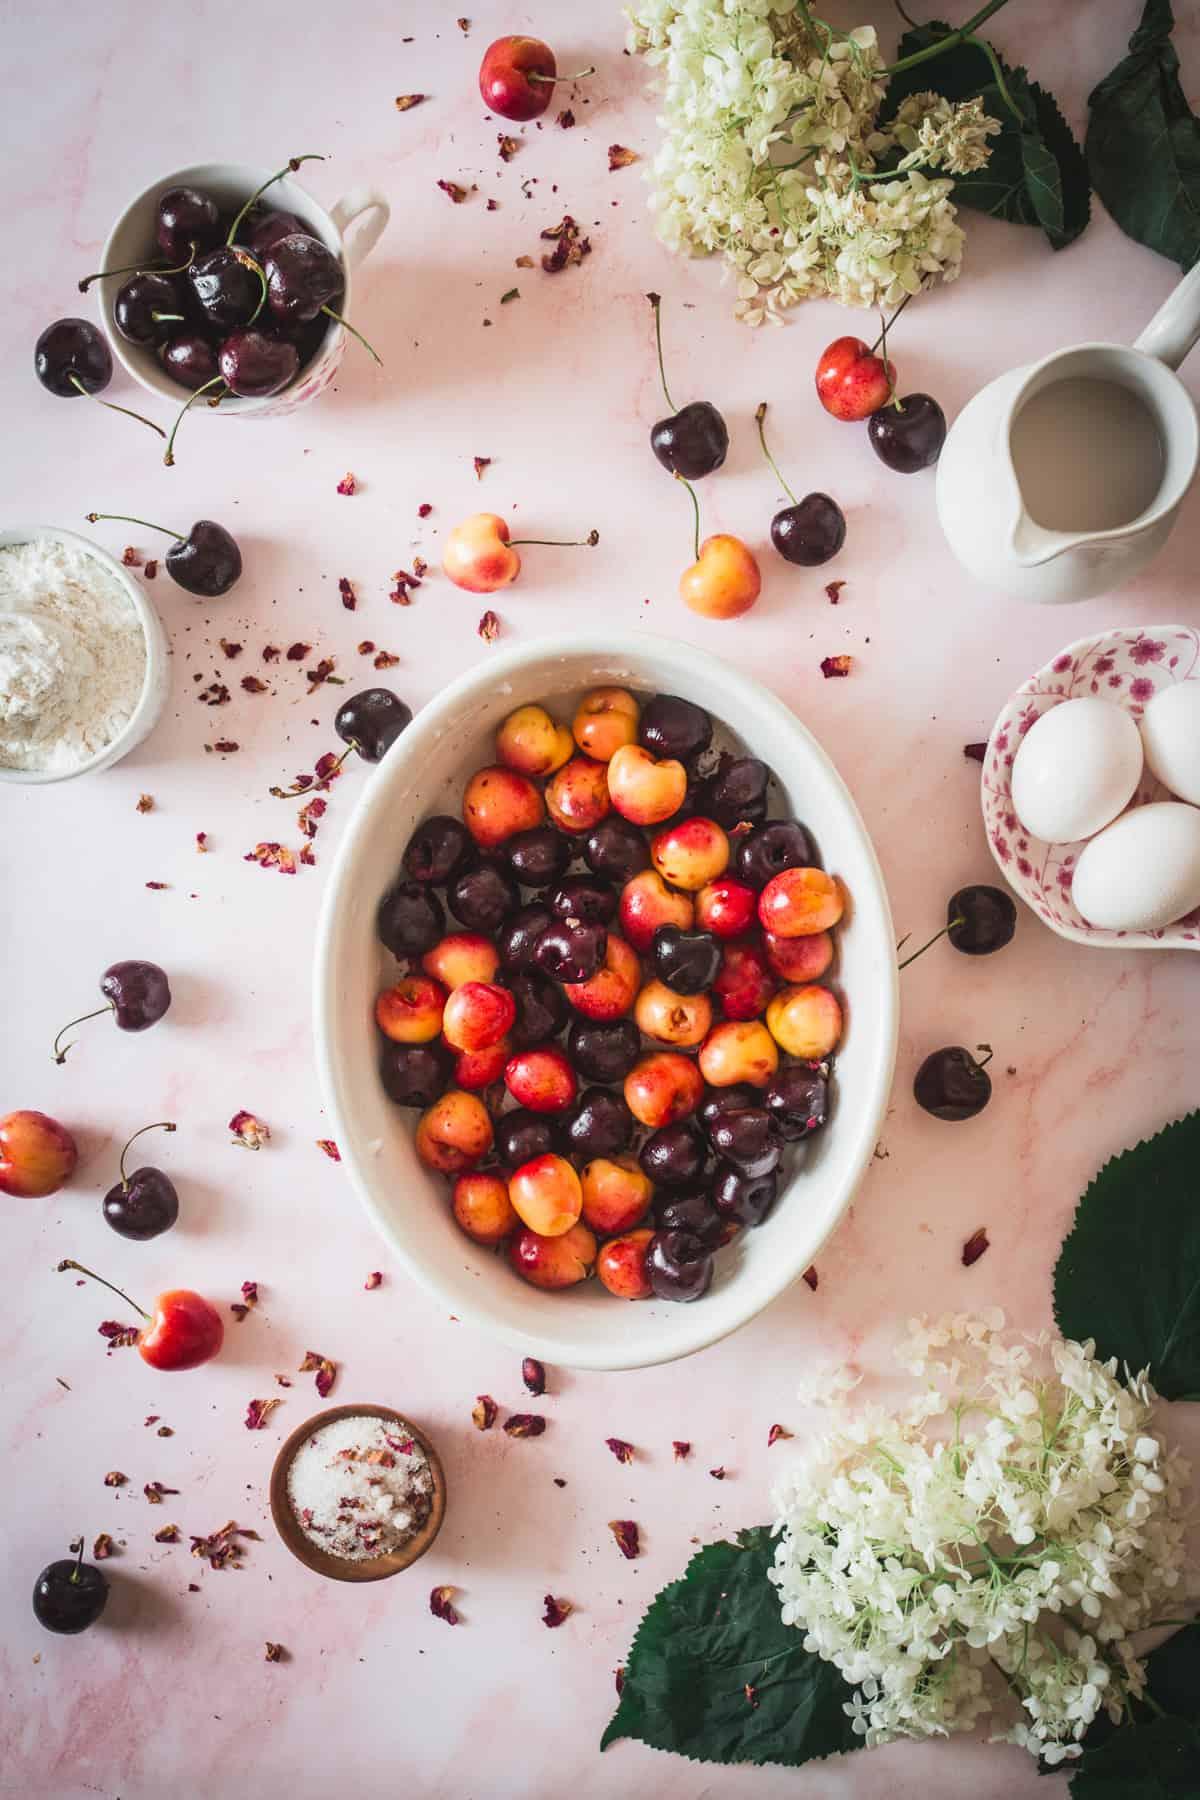 cherries in casserole dish